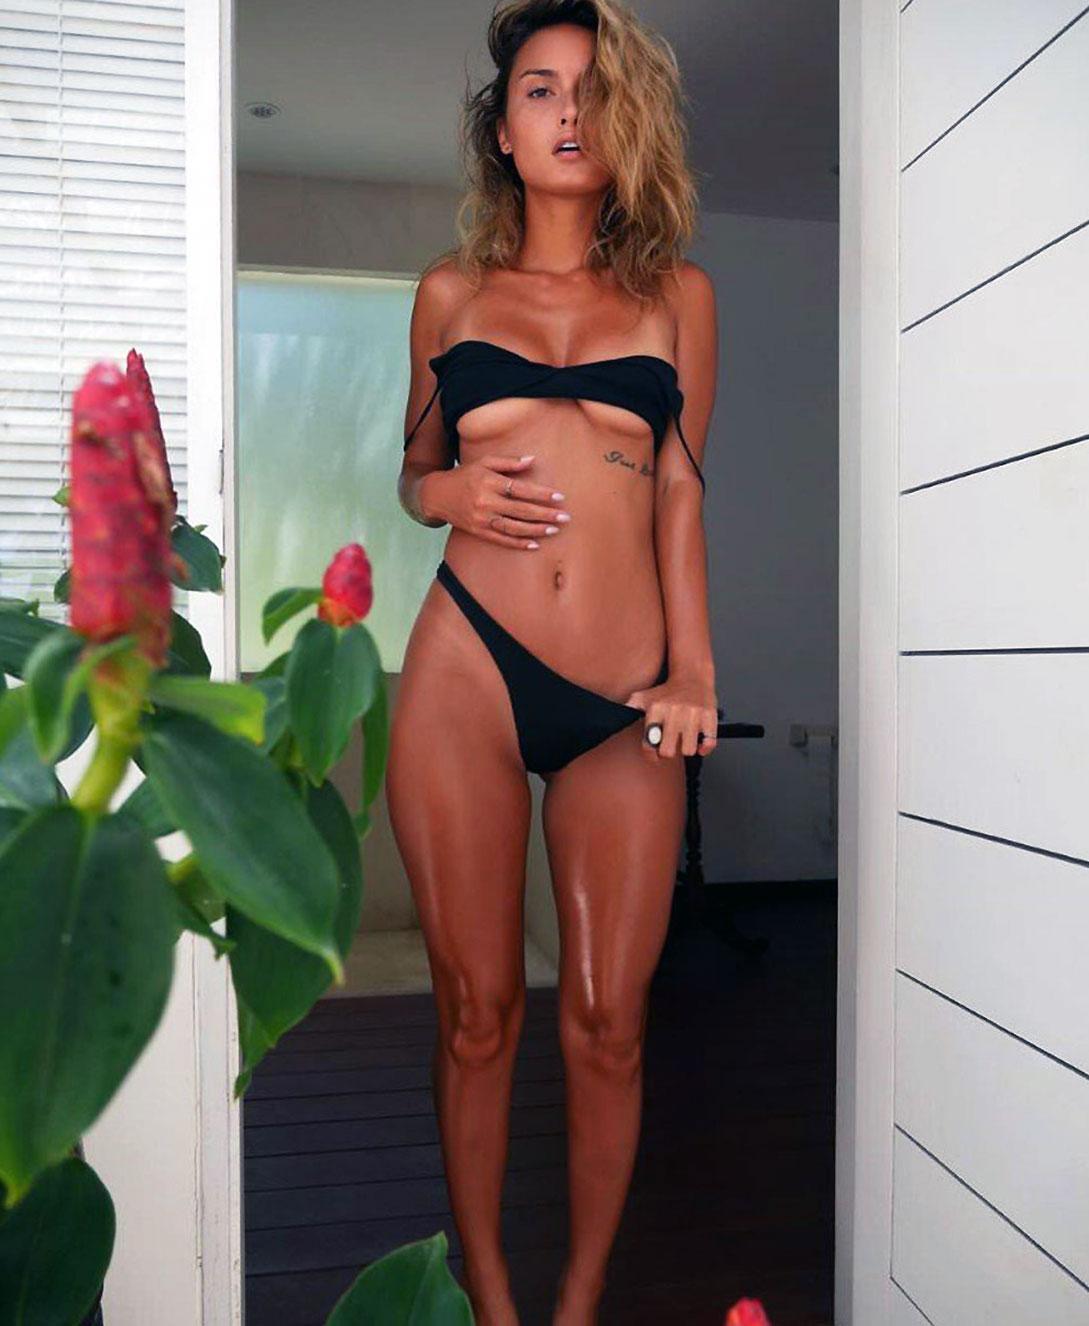 Alyson Hannigan nude photos: Readhead will leave you